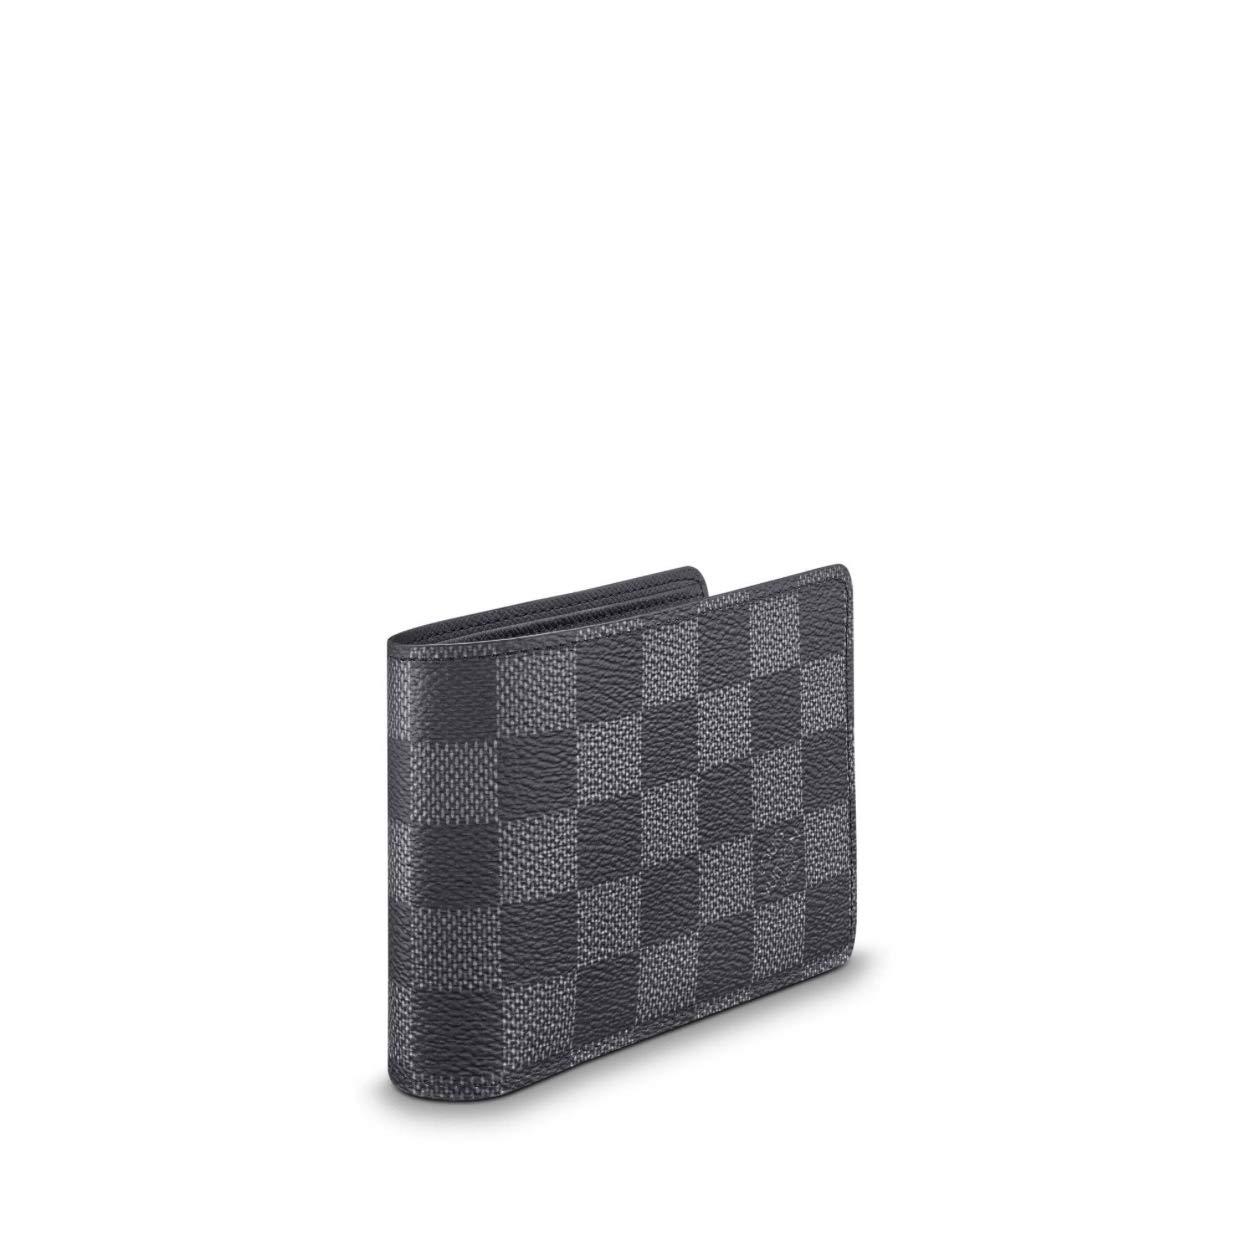 Amazon.com: Louis Vuitton Damier N62663 - Cartera de lona de ...